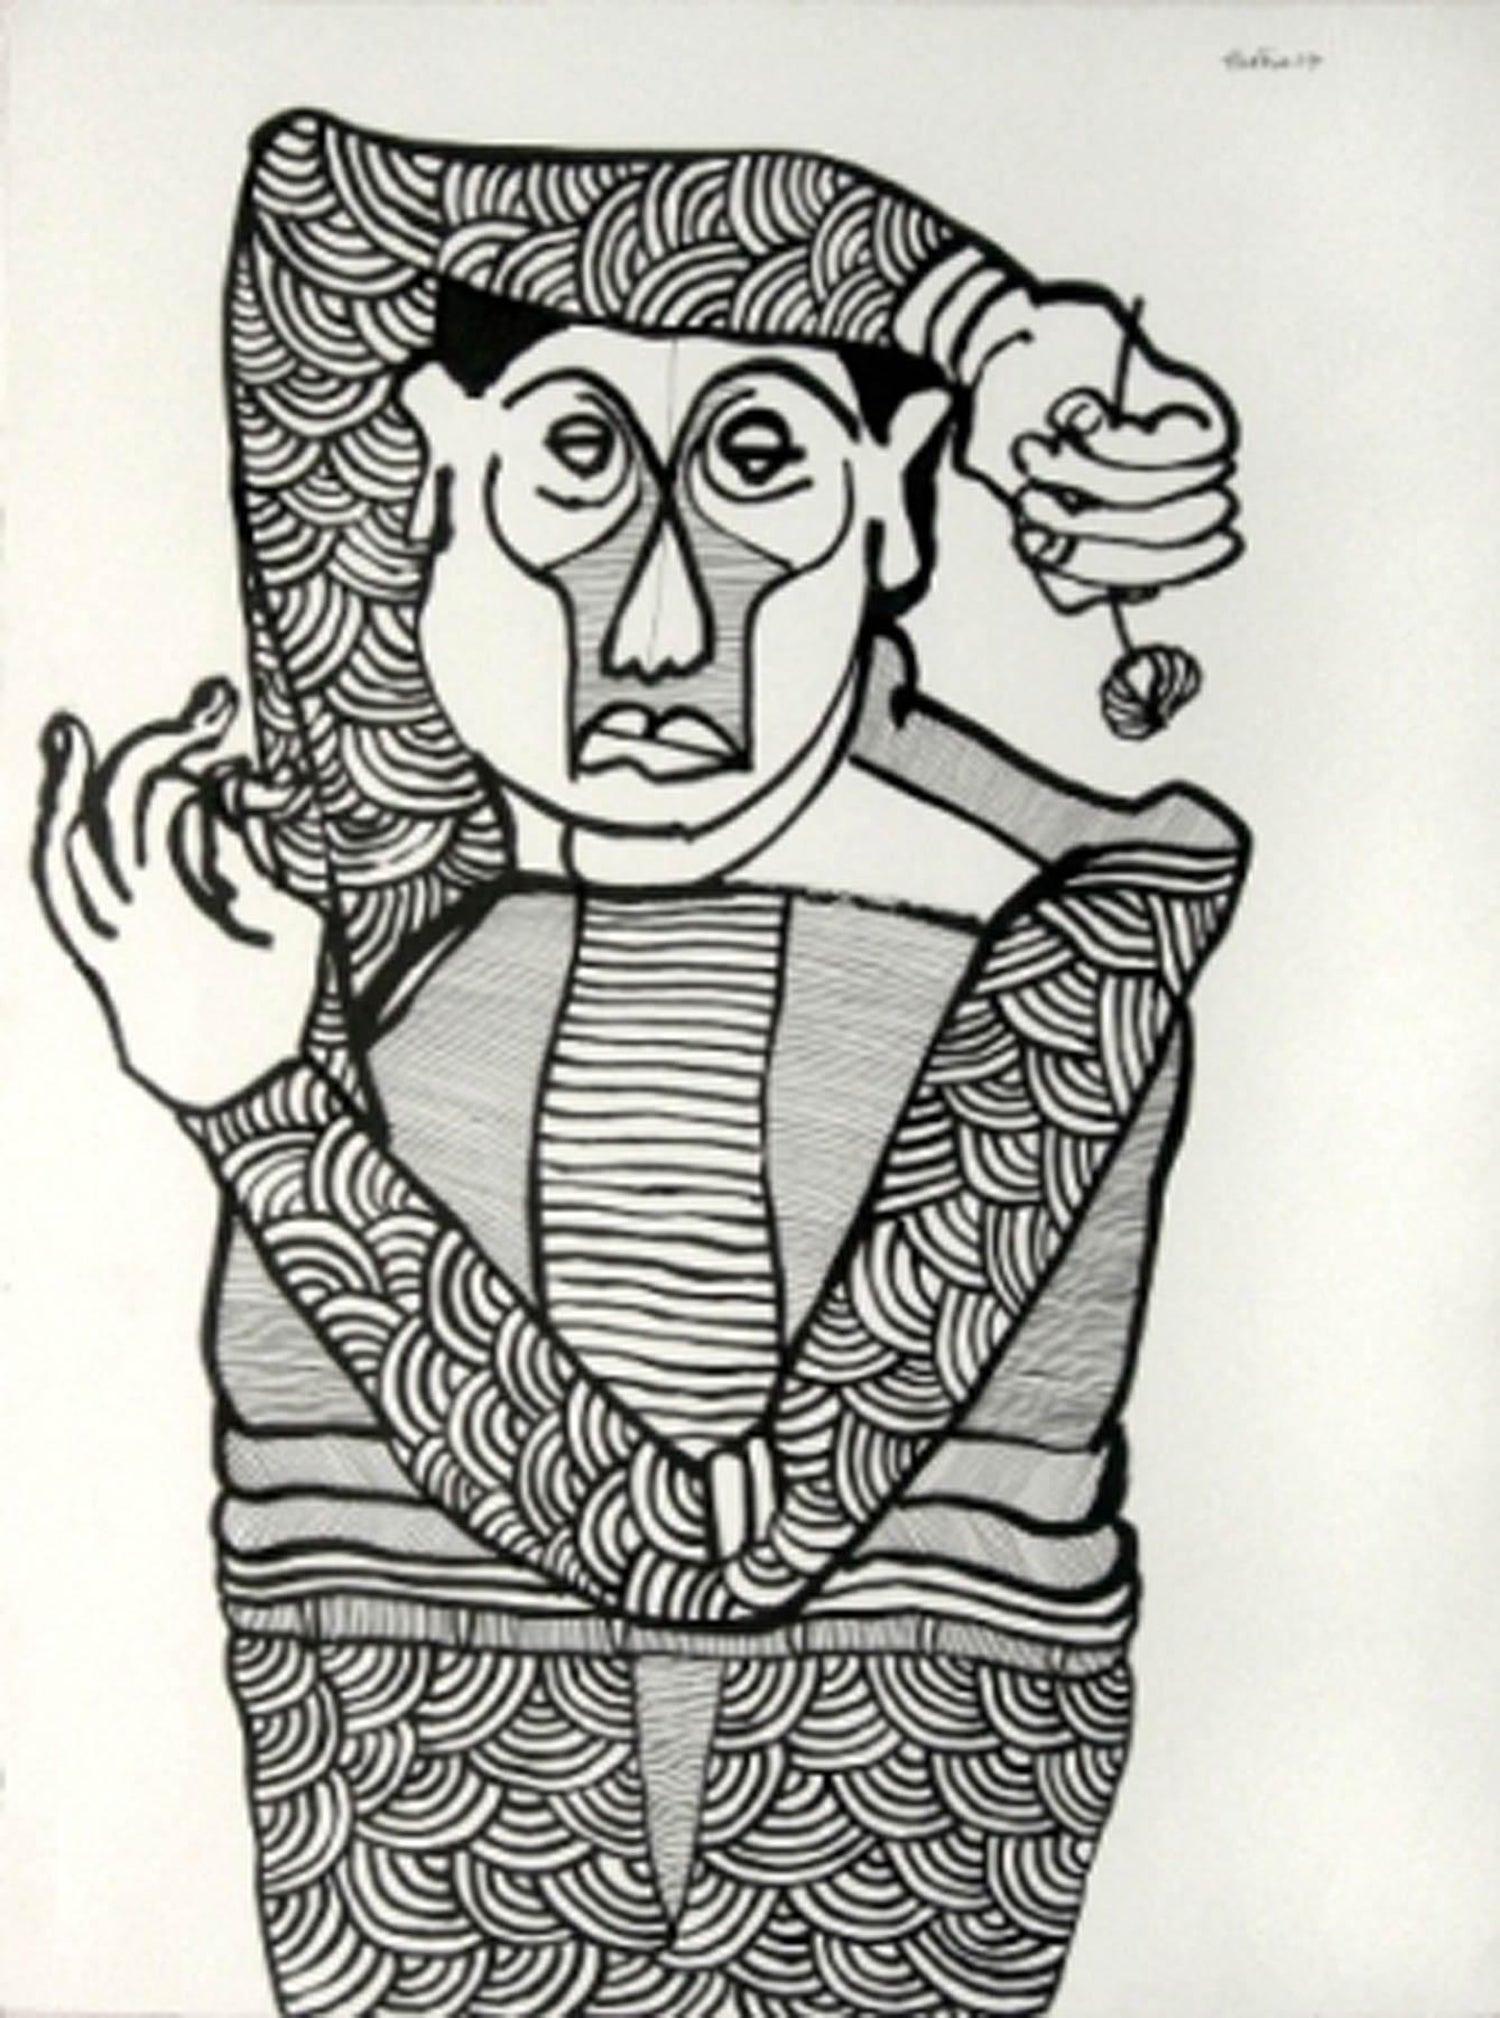 Partha pratim deb funiculli drawing ink on paper black